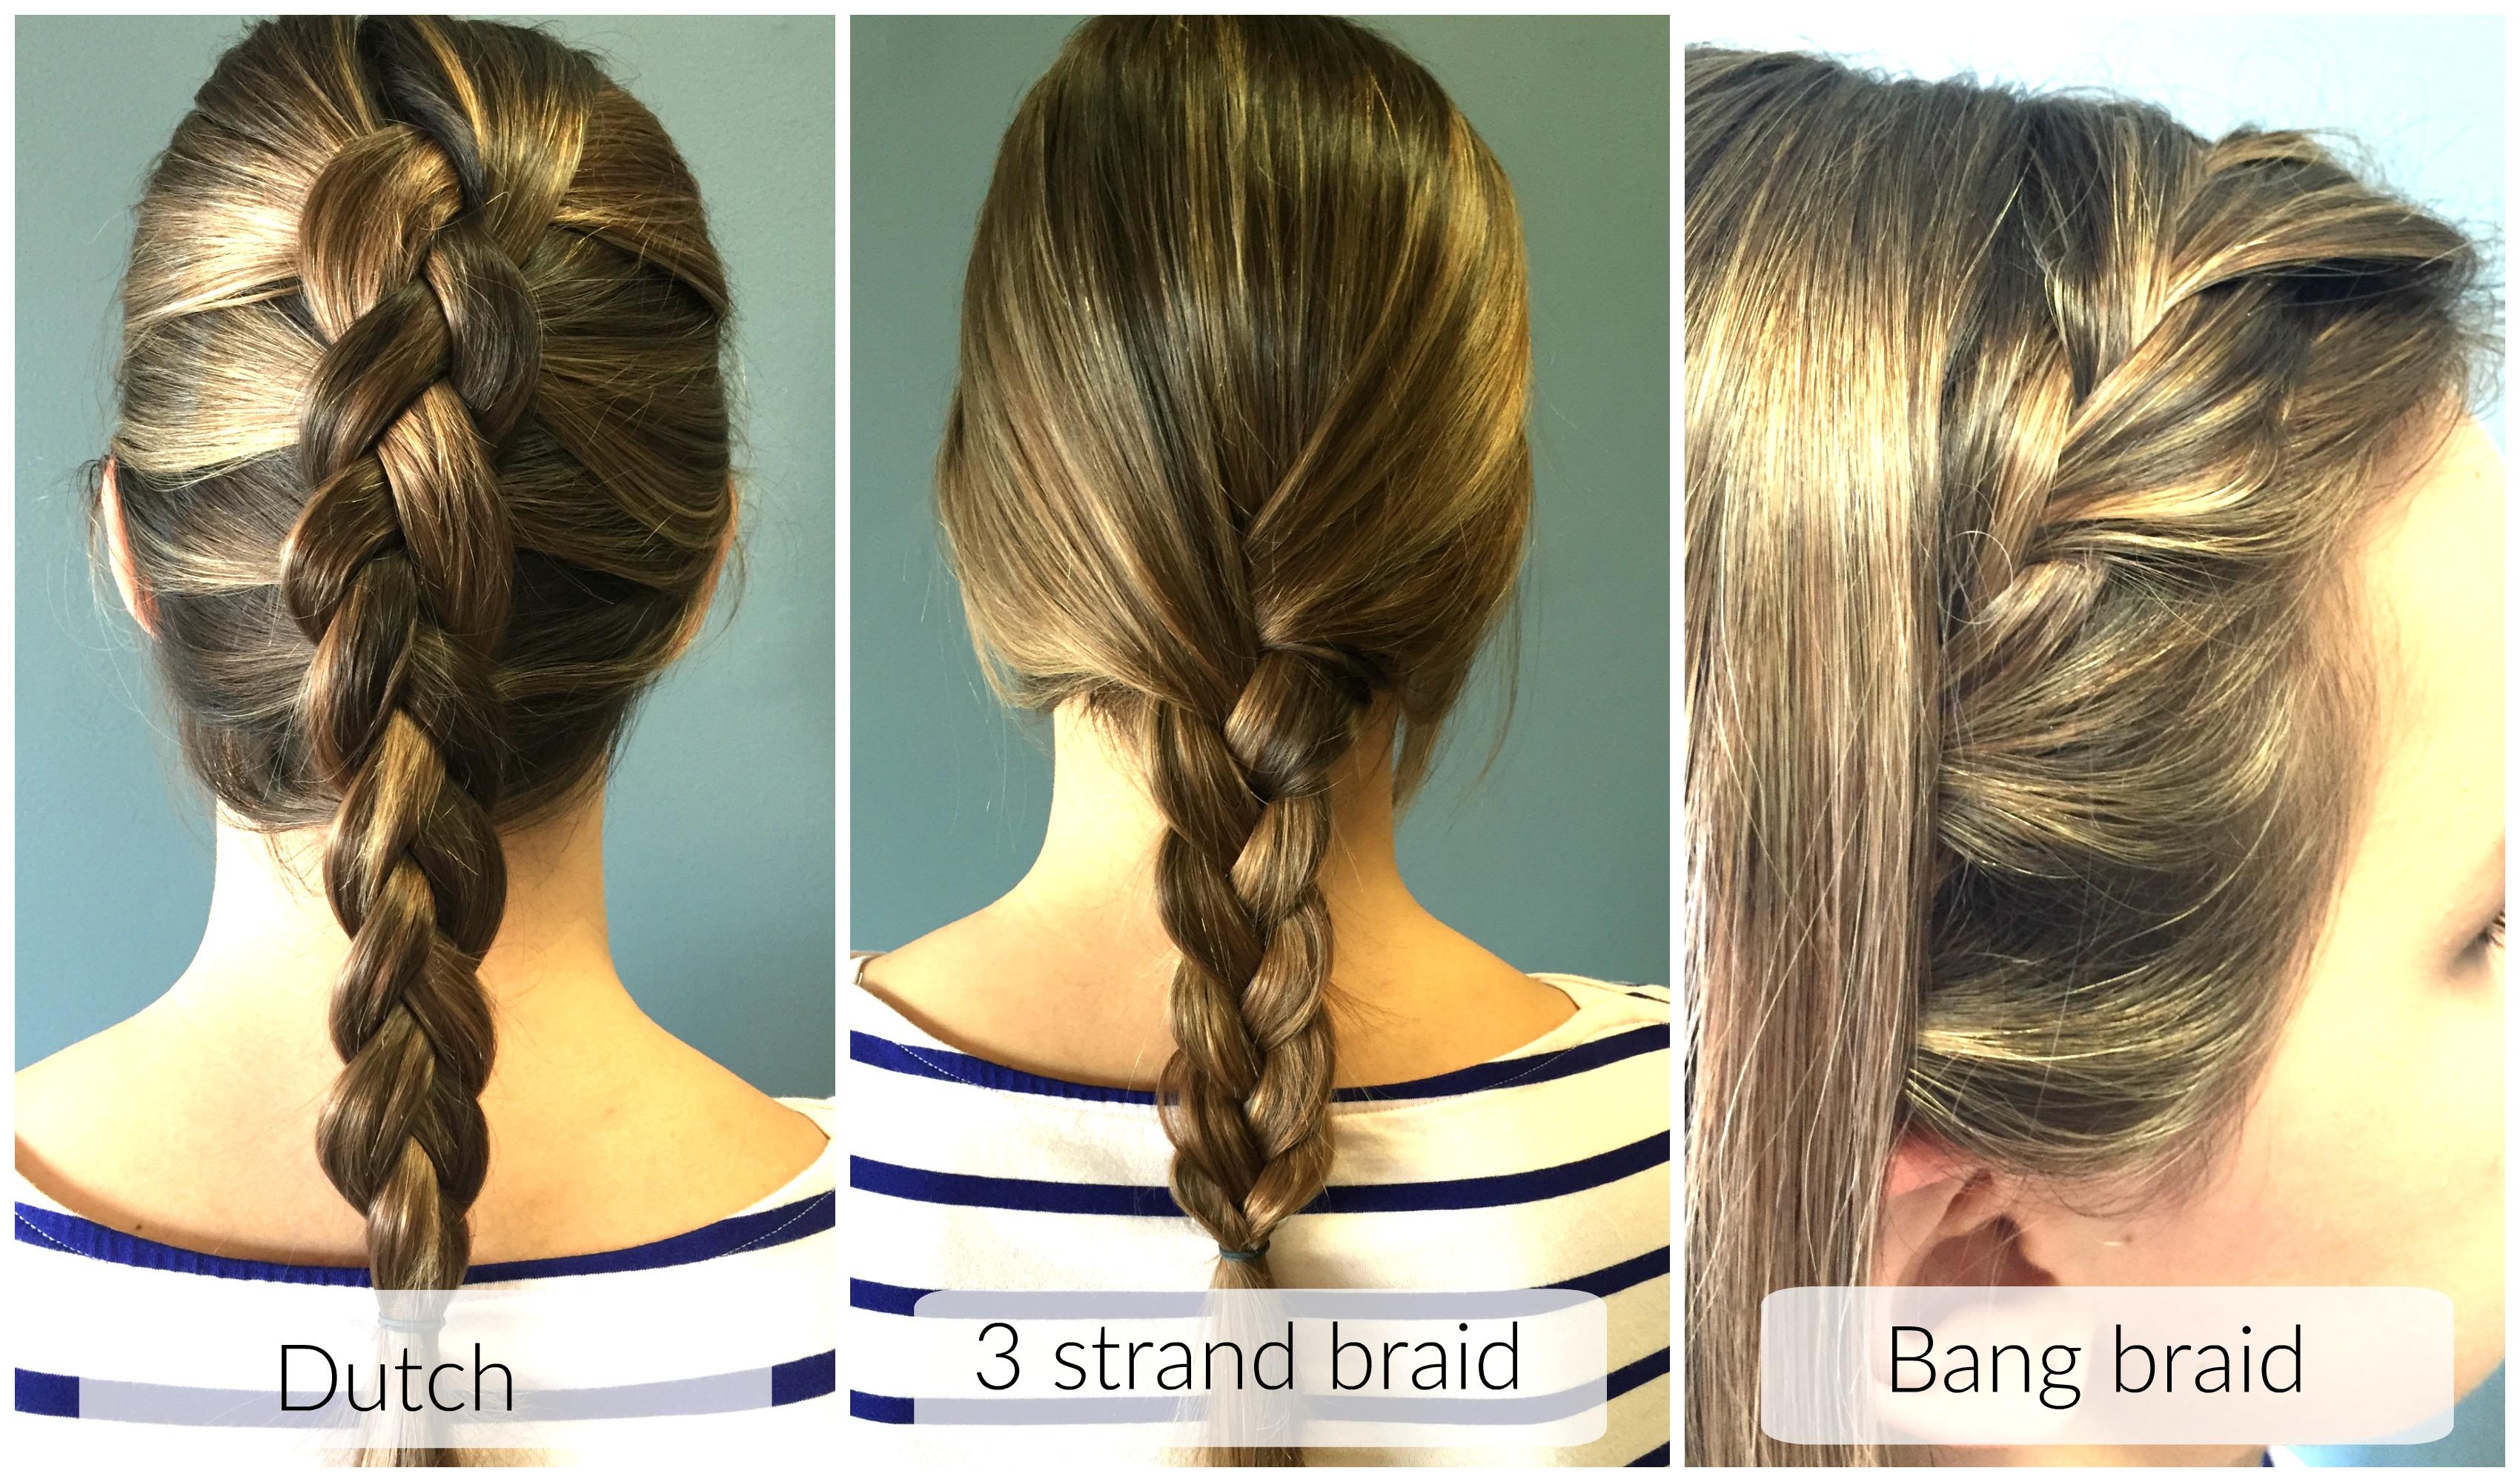 $17 braids group 2